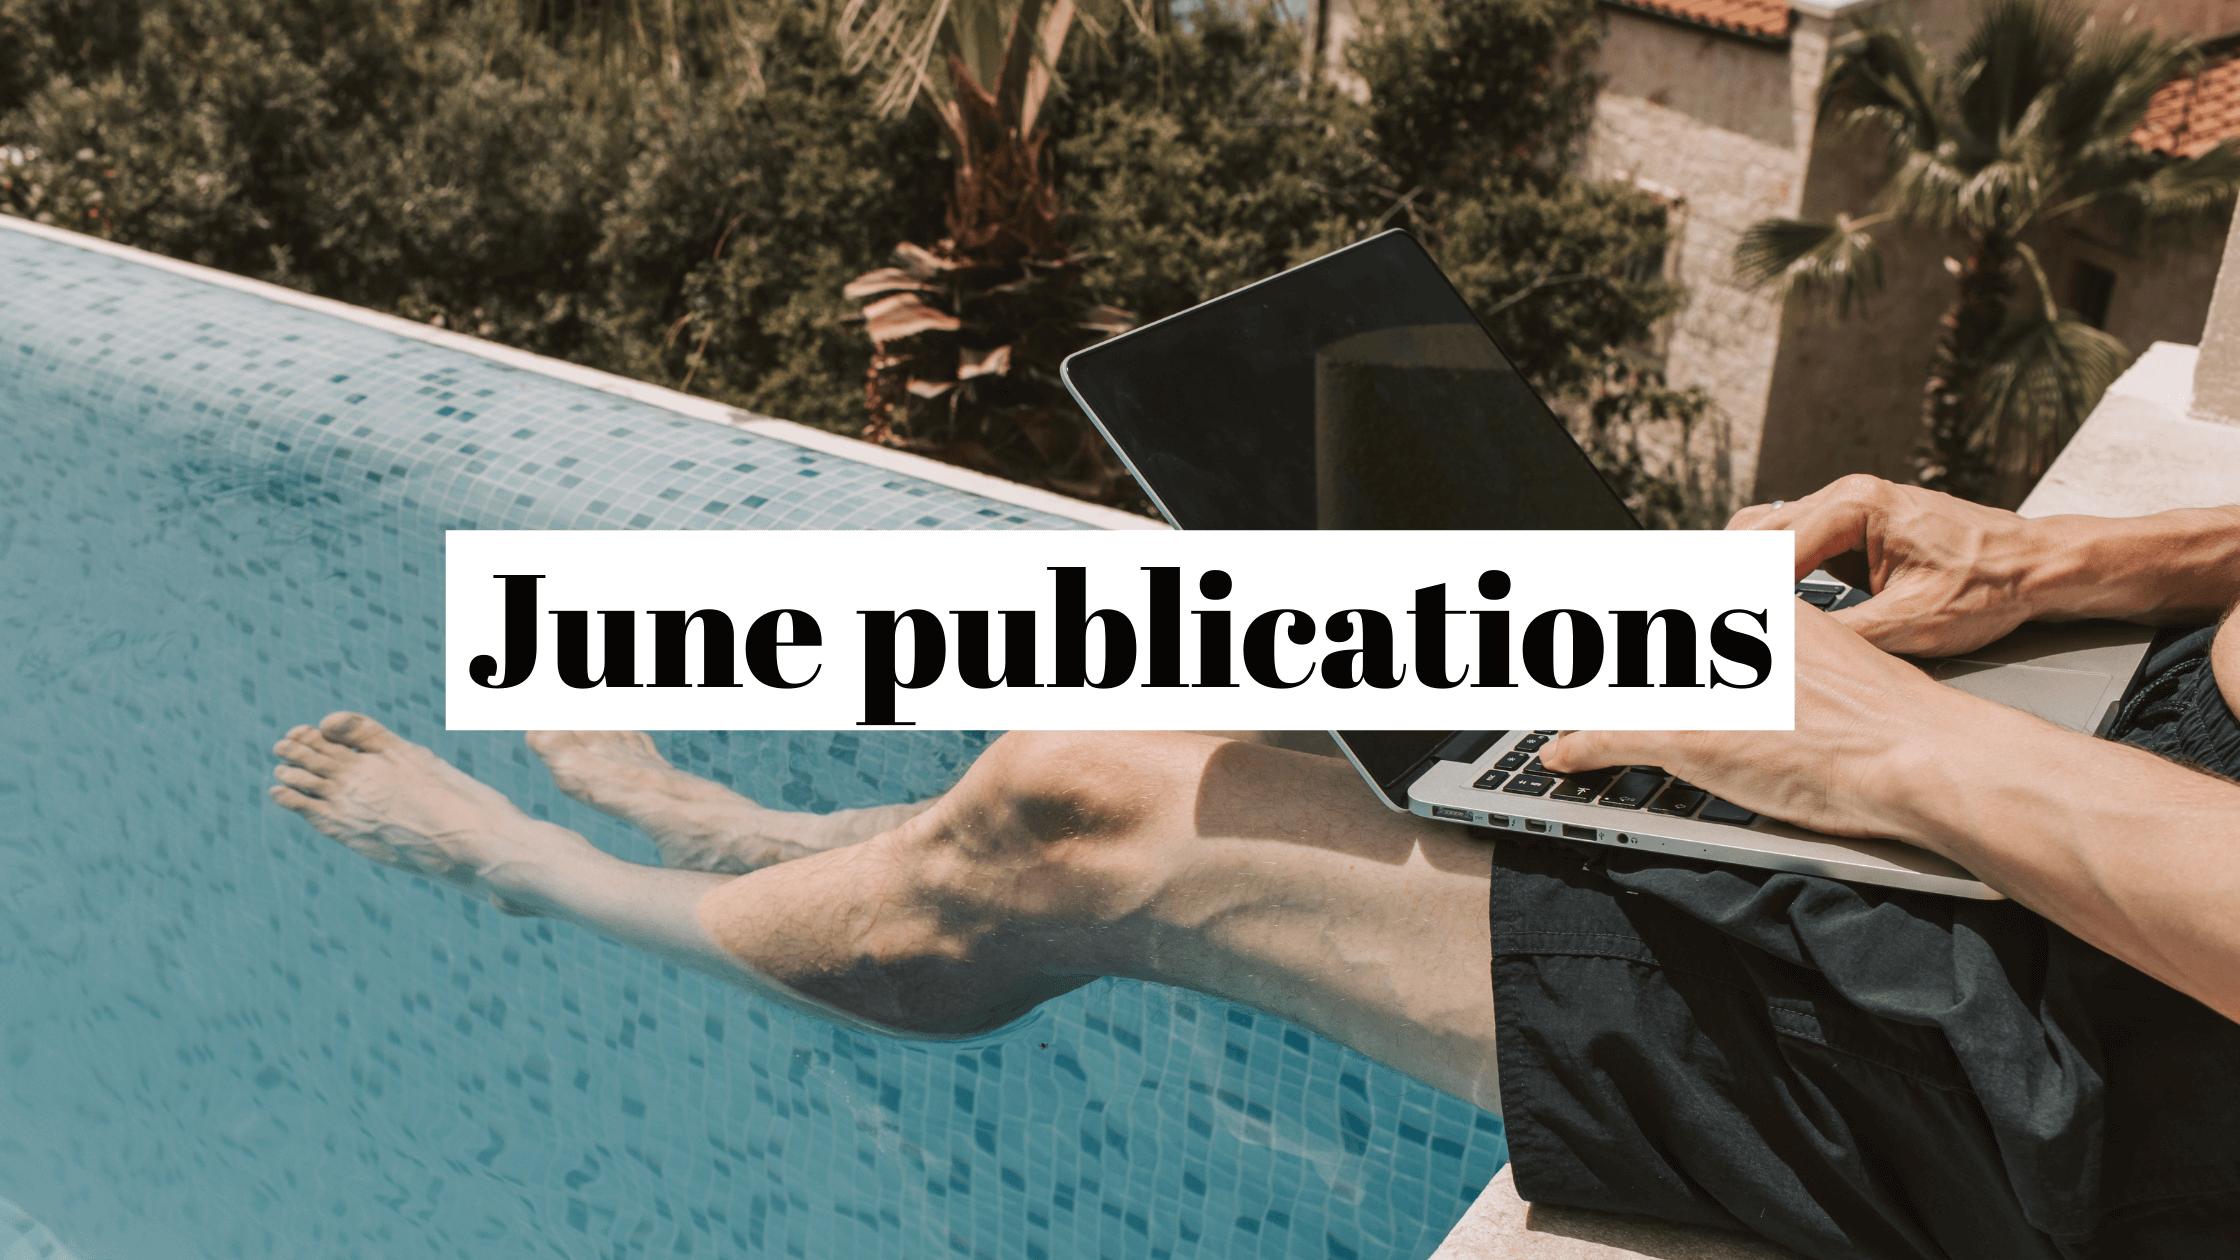 Truesix's June 2021 – chasing the rays of media coverage